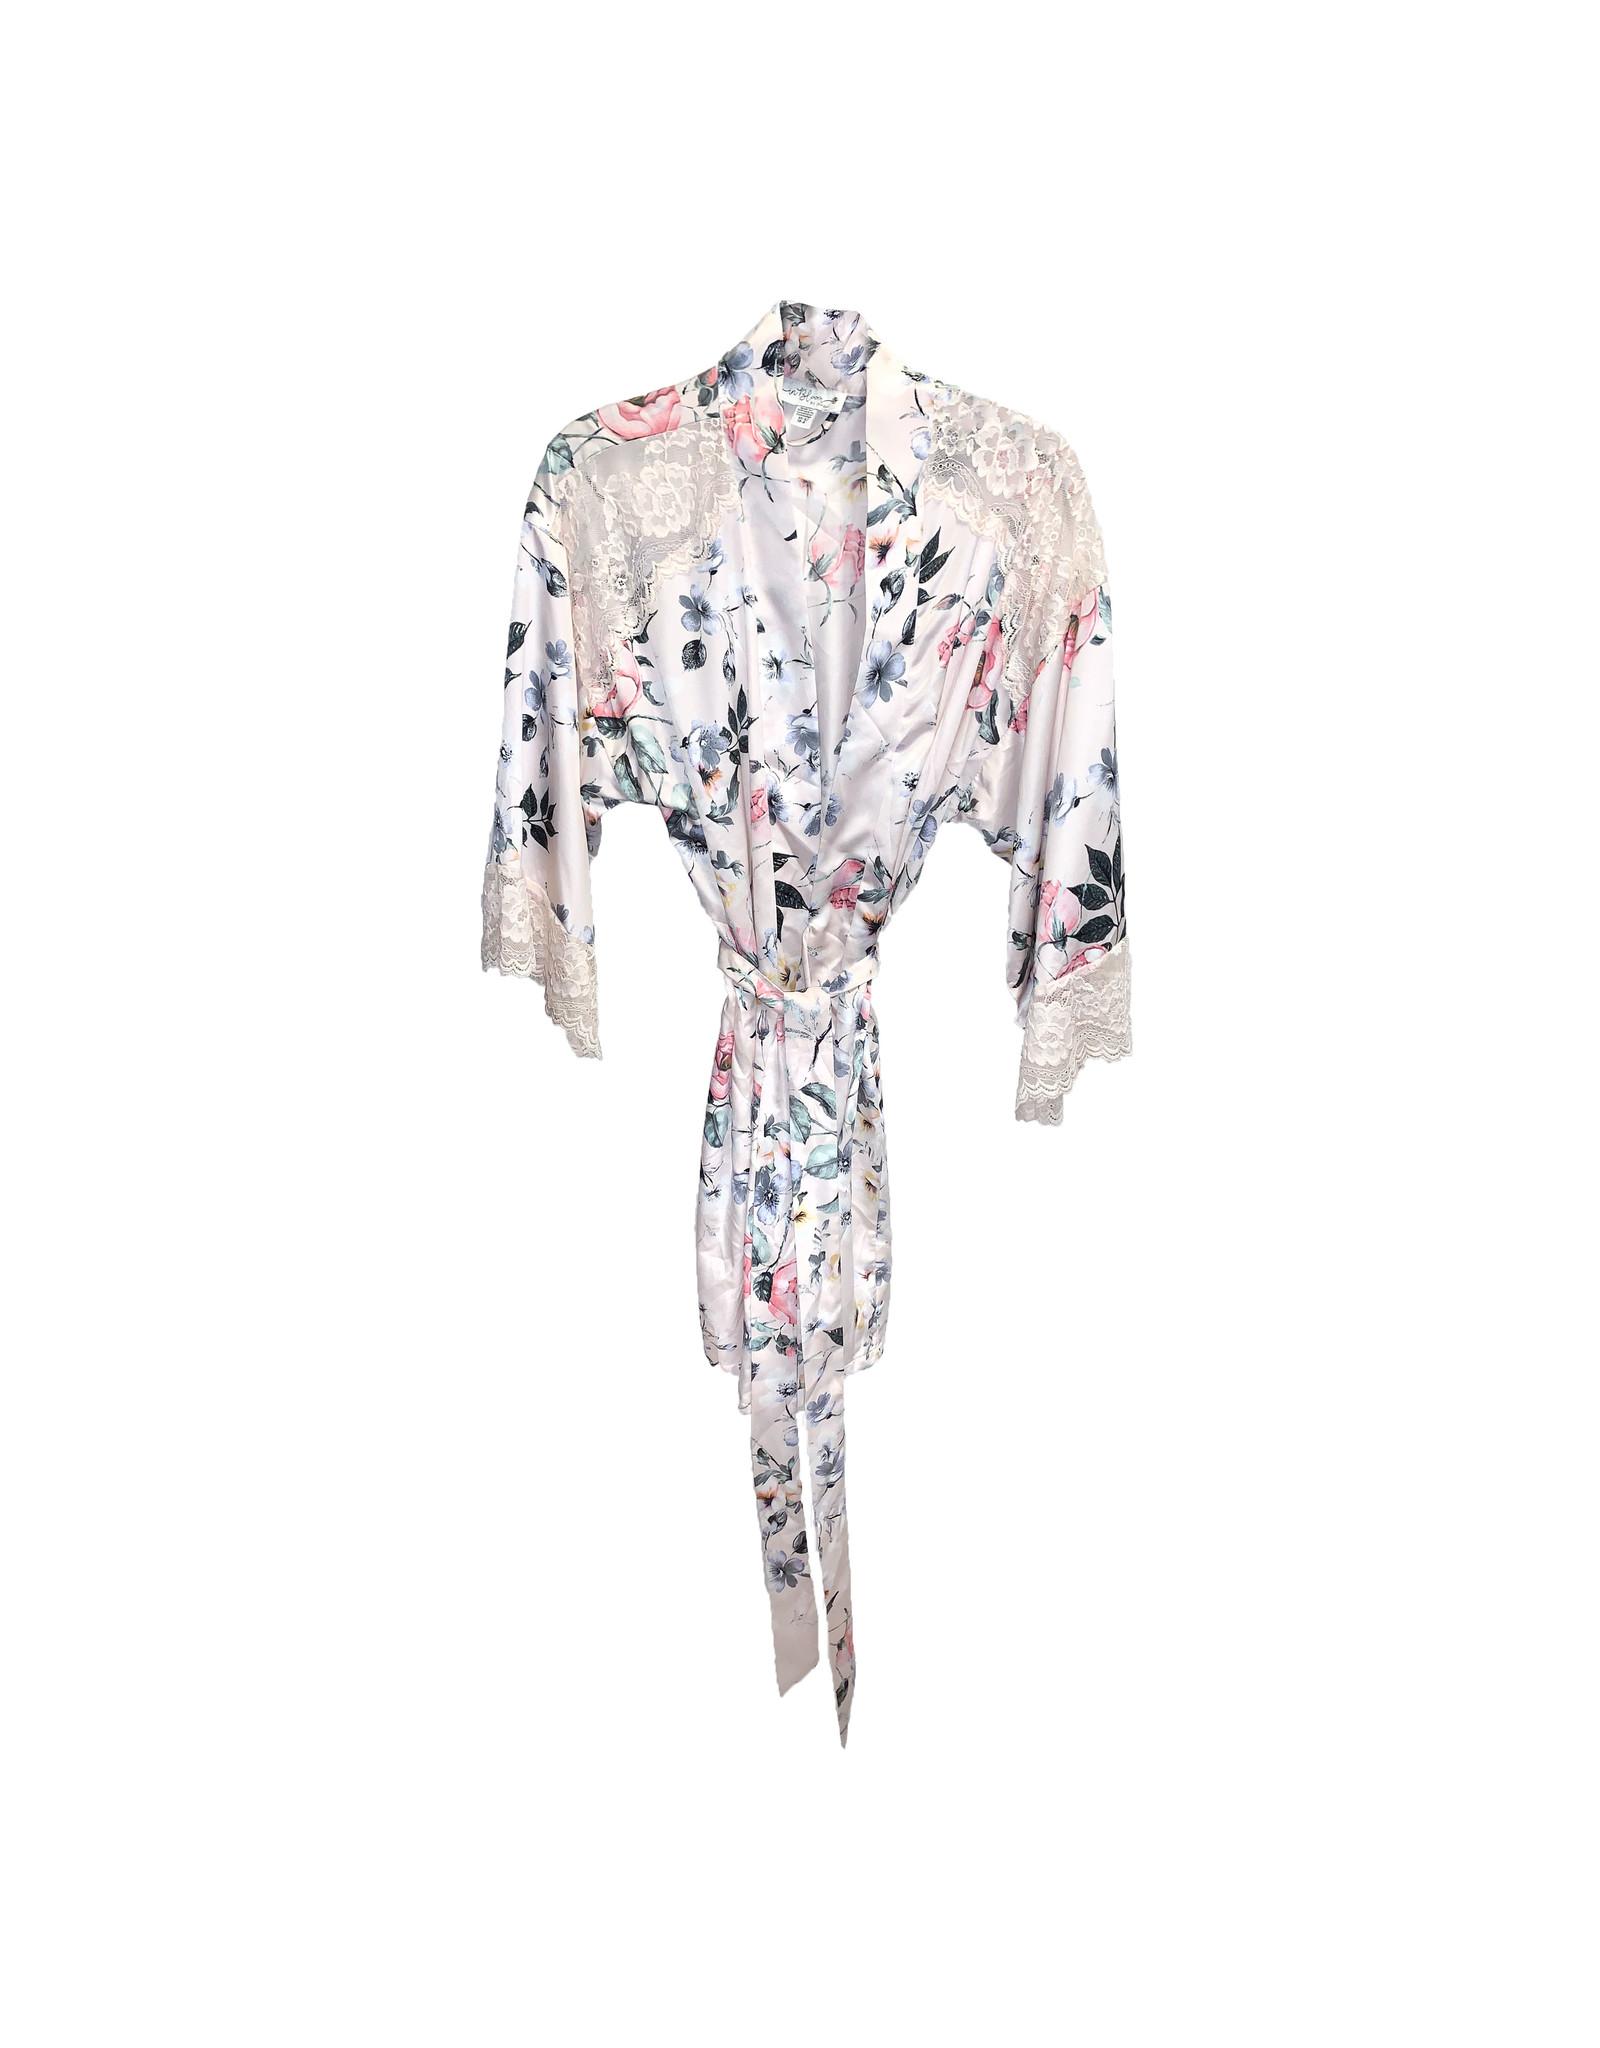 In Bloom In Bloom Floral  Print Satin  Robe SizeXS/S